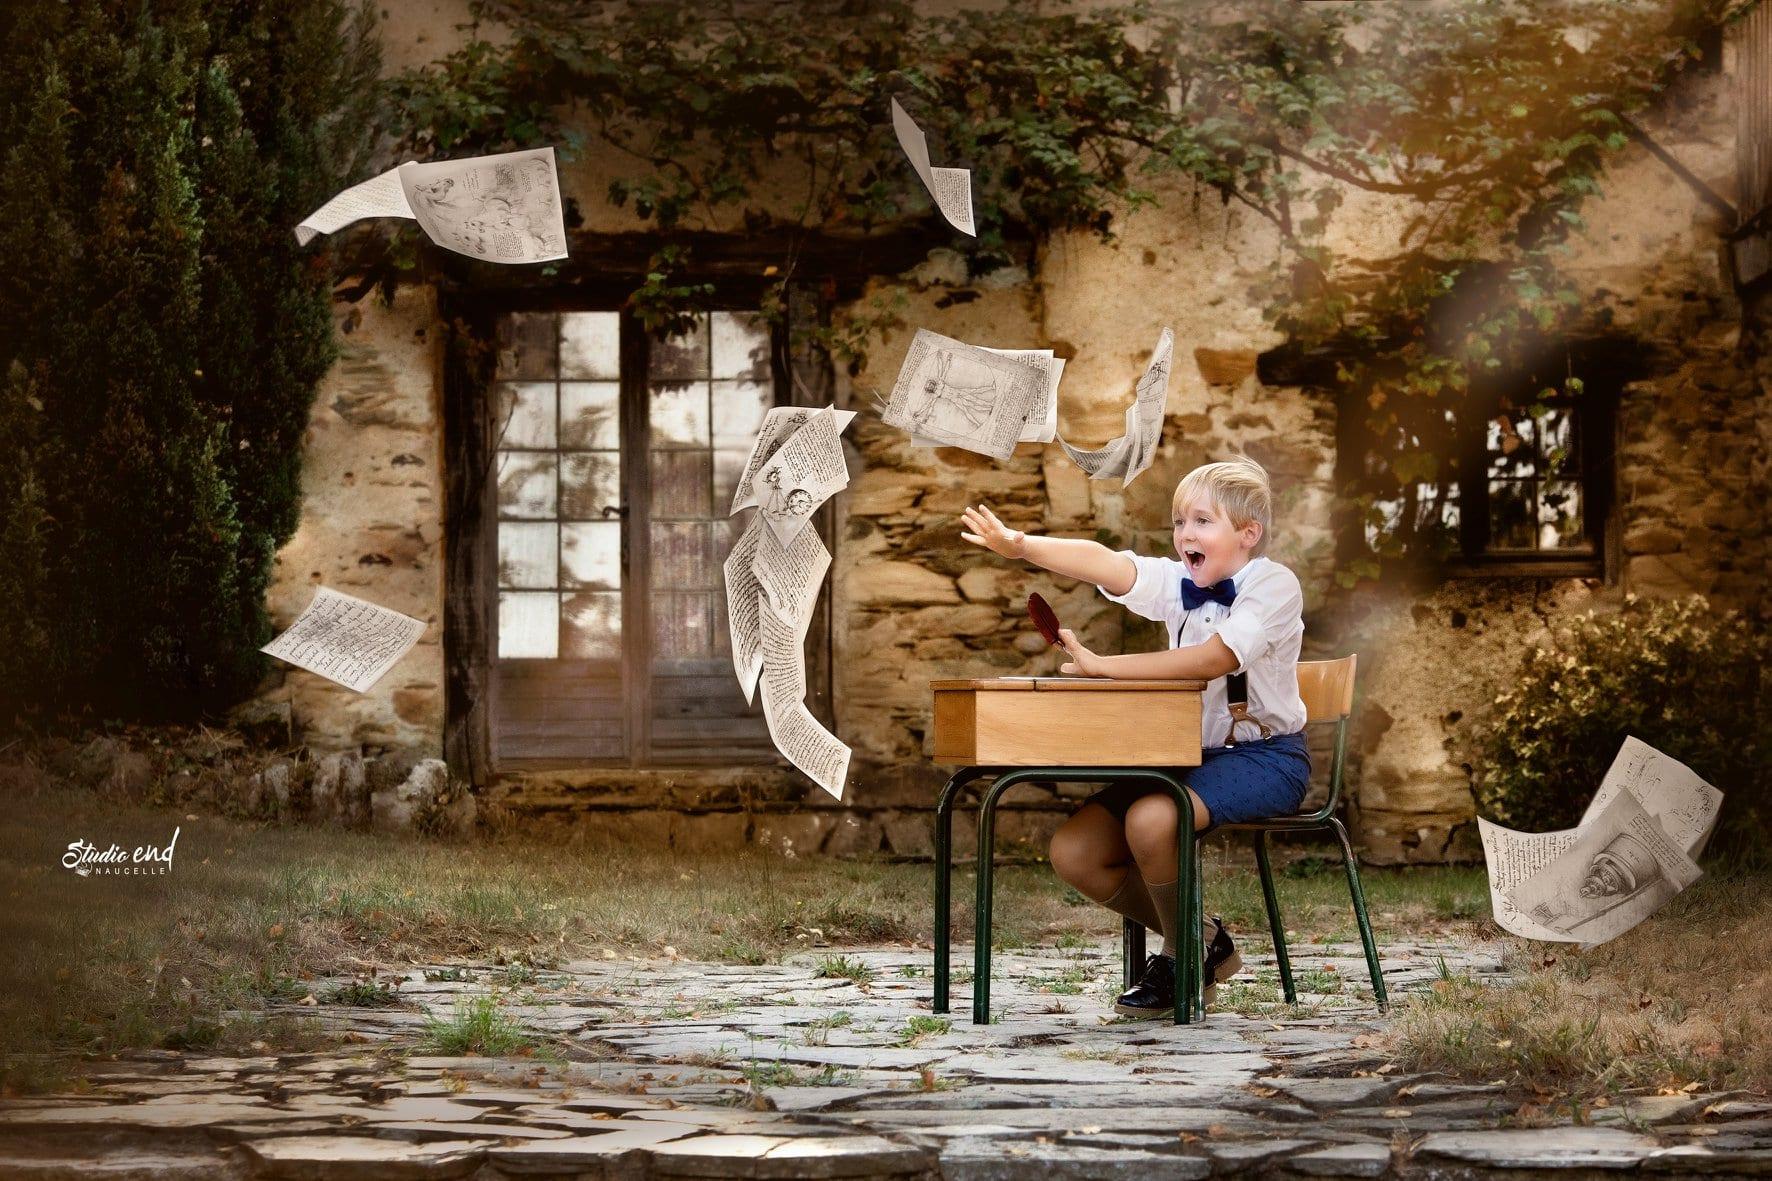 photographies d'art, photographe artistes Aveyron, STUDIO END®